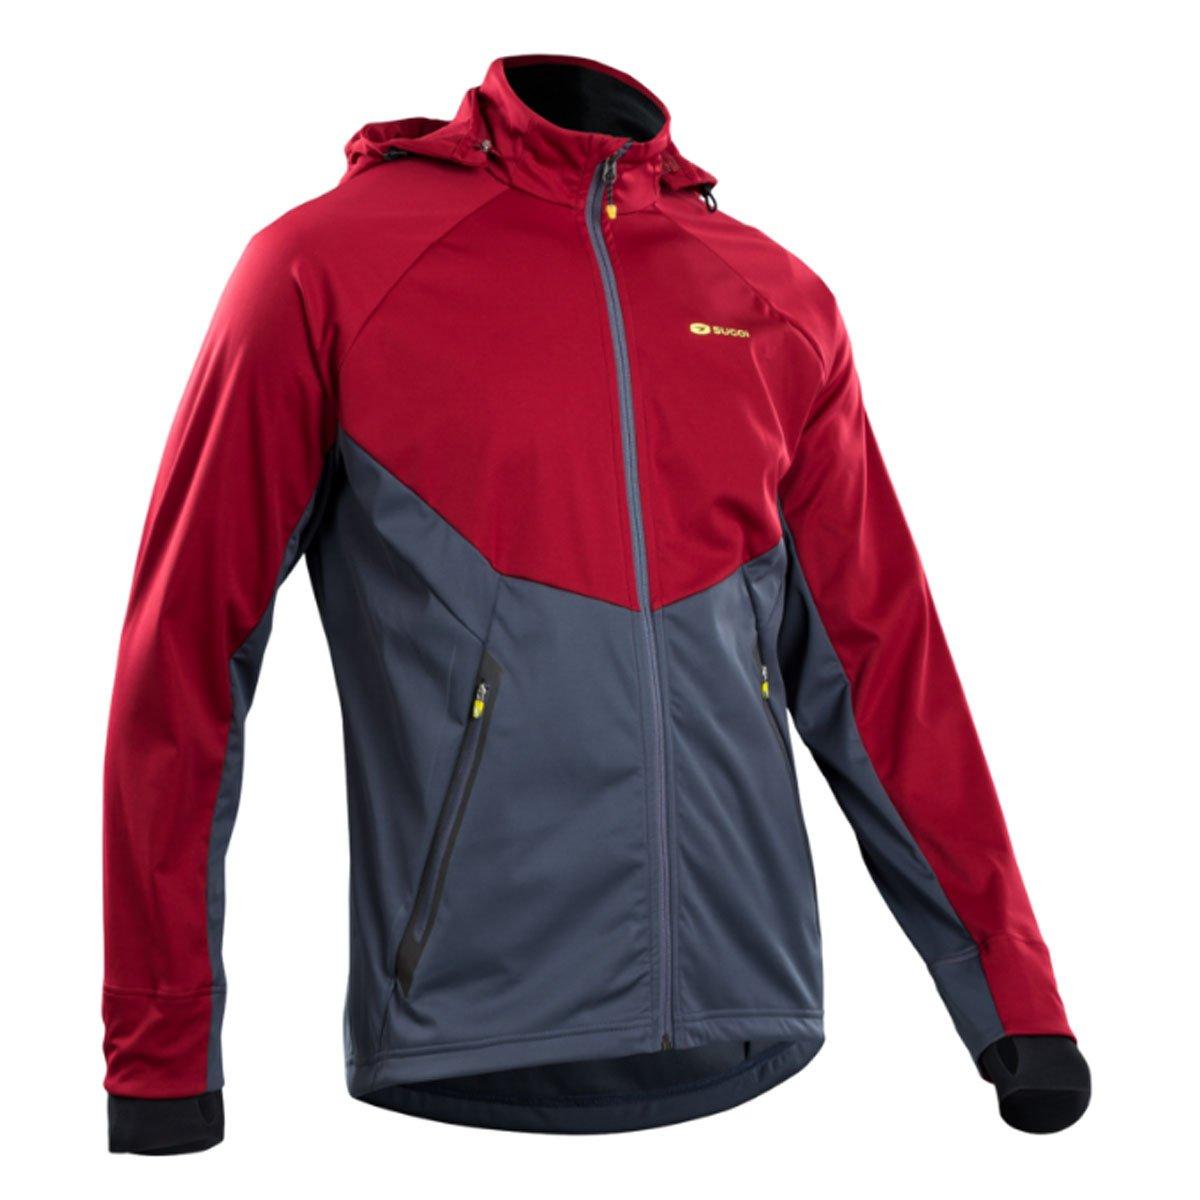 Sugoiファイアウォール180 Jacket – Men 's X-Large レッド(Varsity Red) B01LYXPS7P